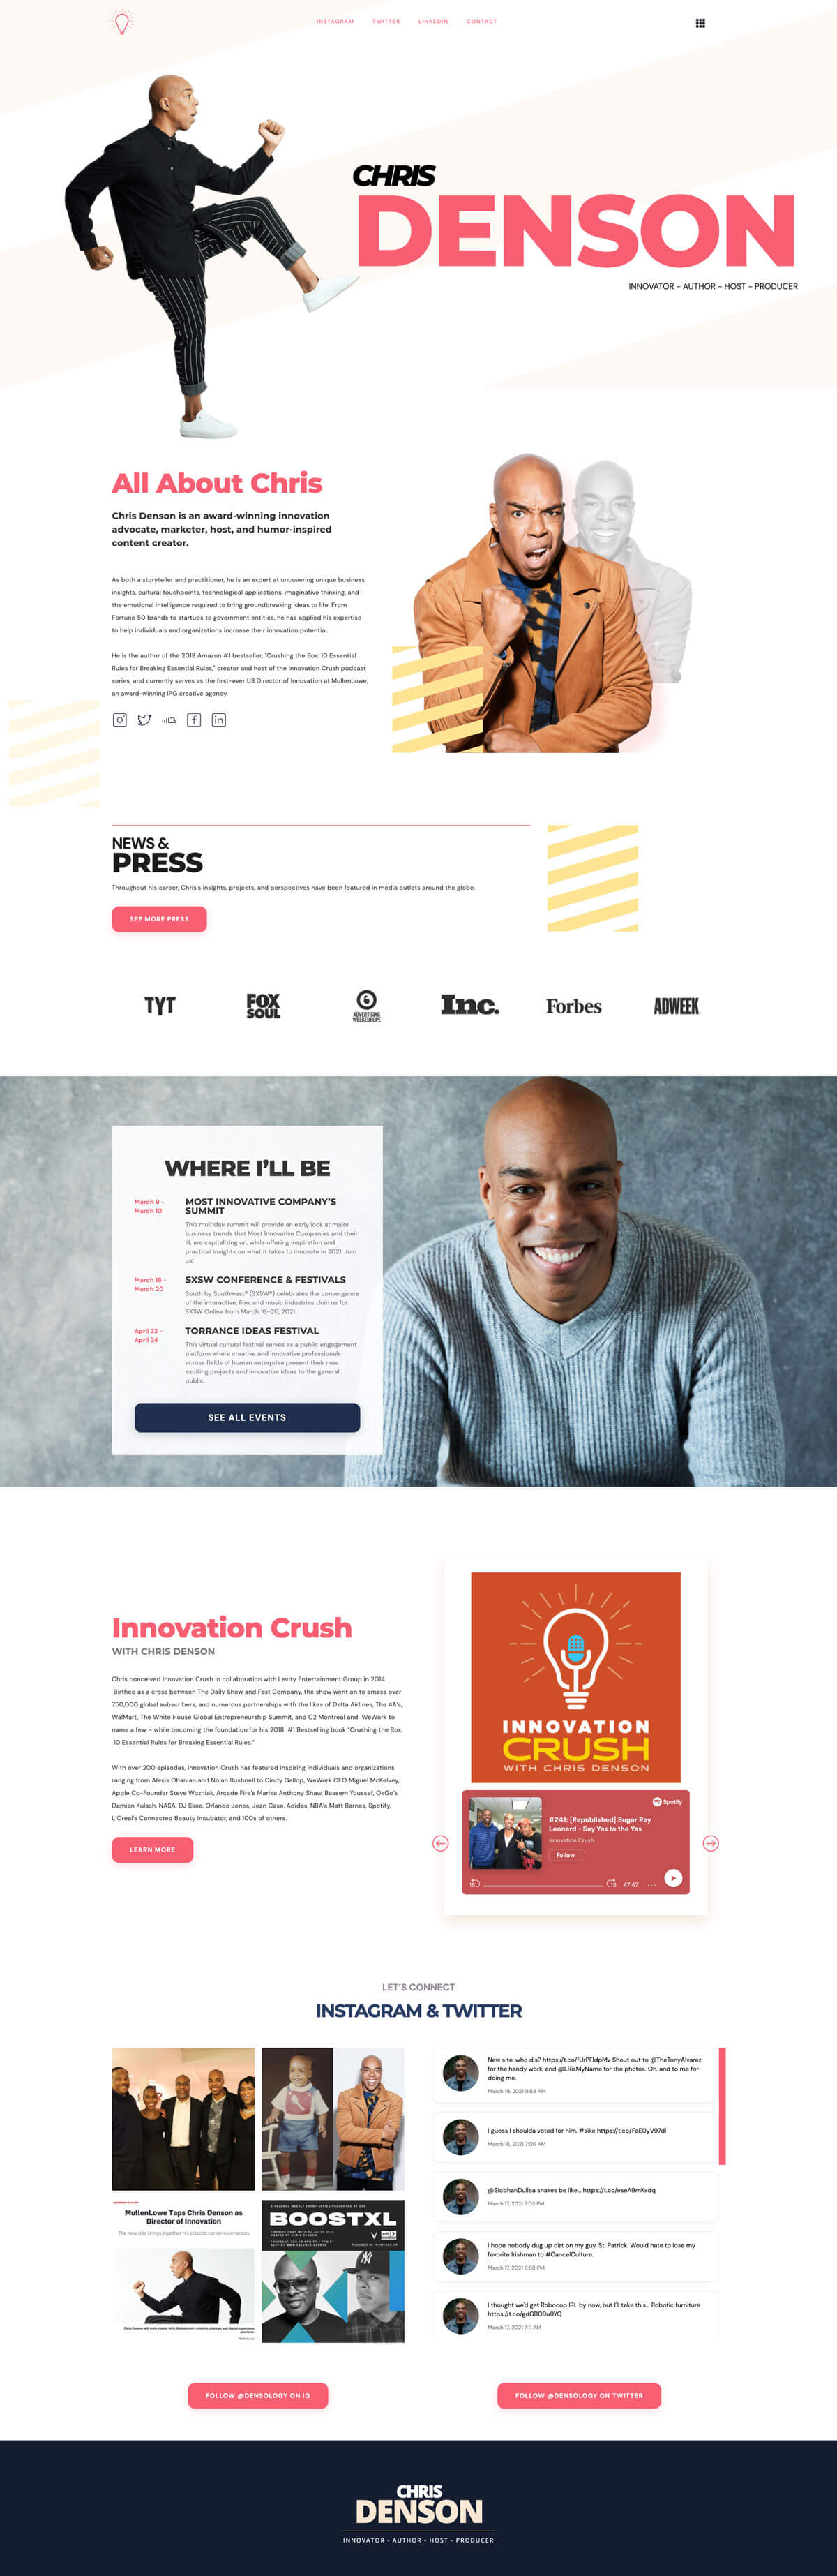 Chris Denson: Web Design